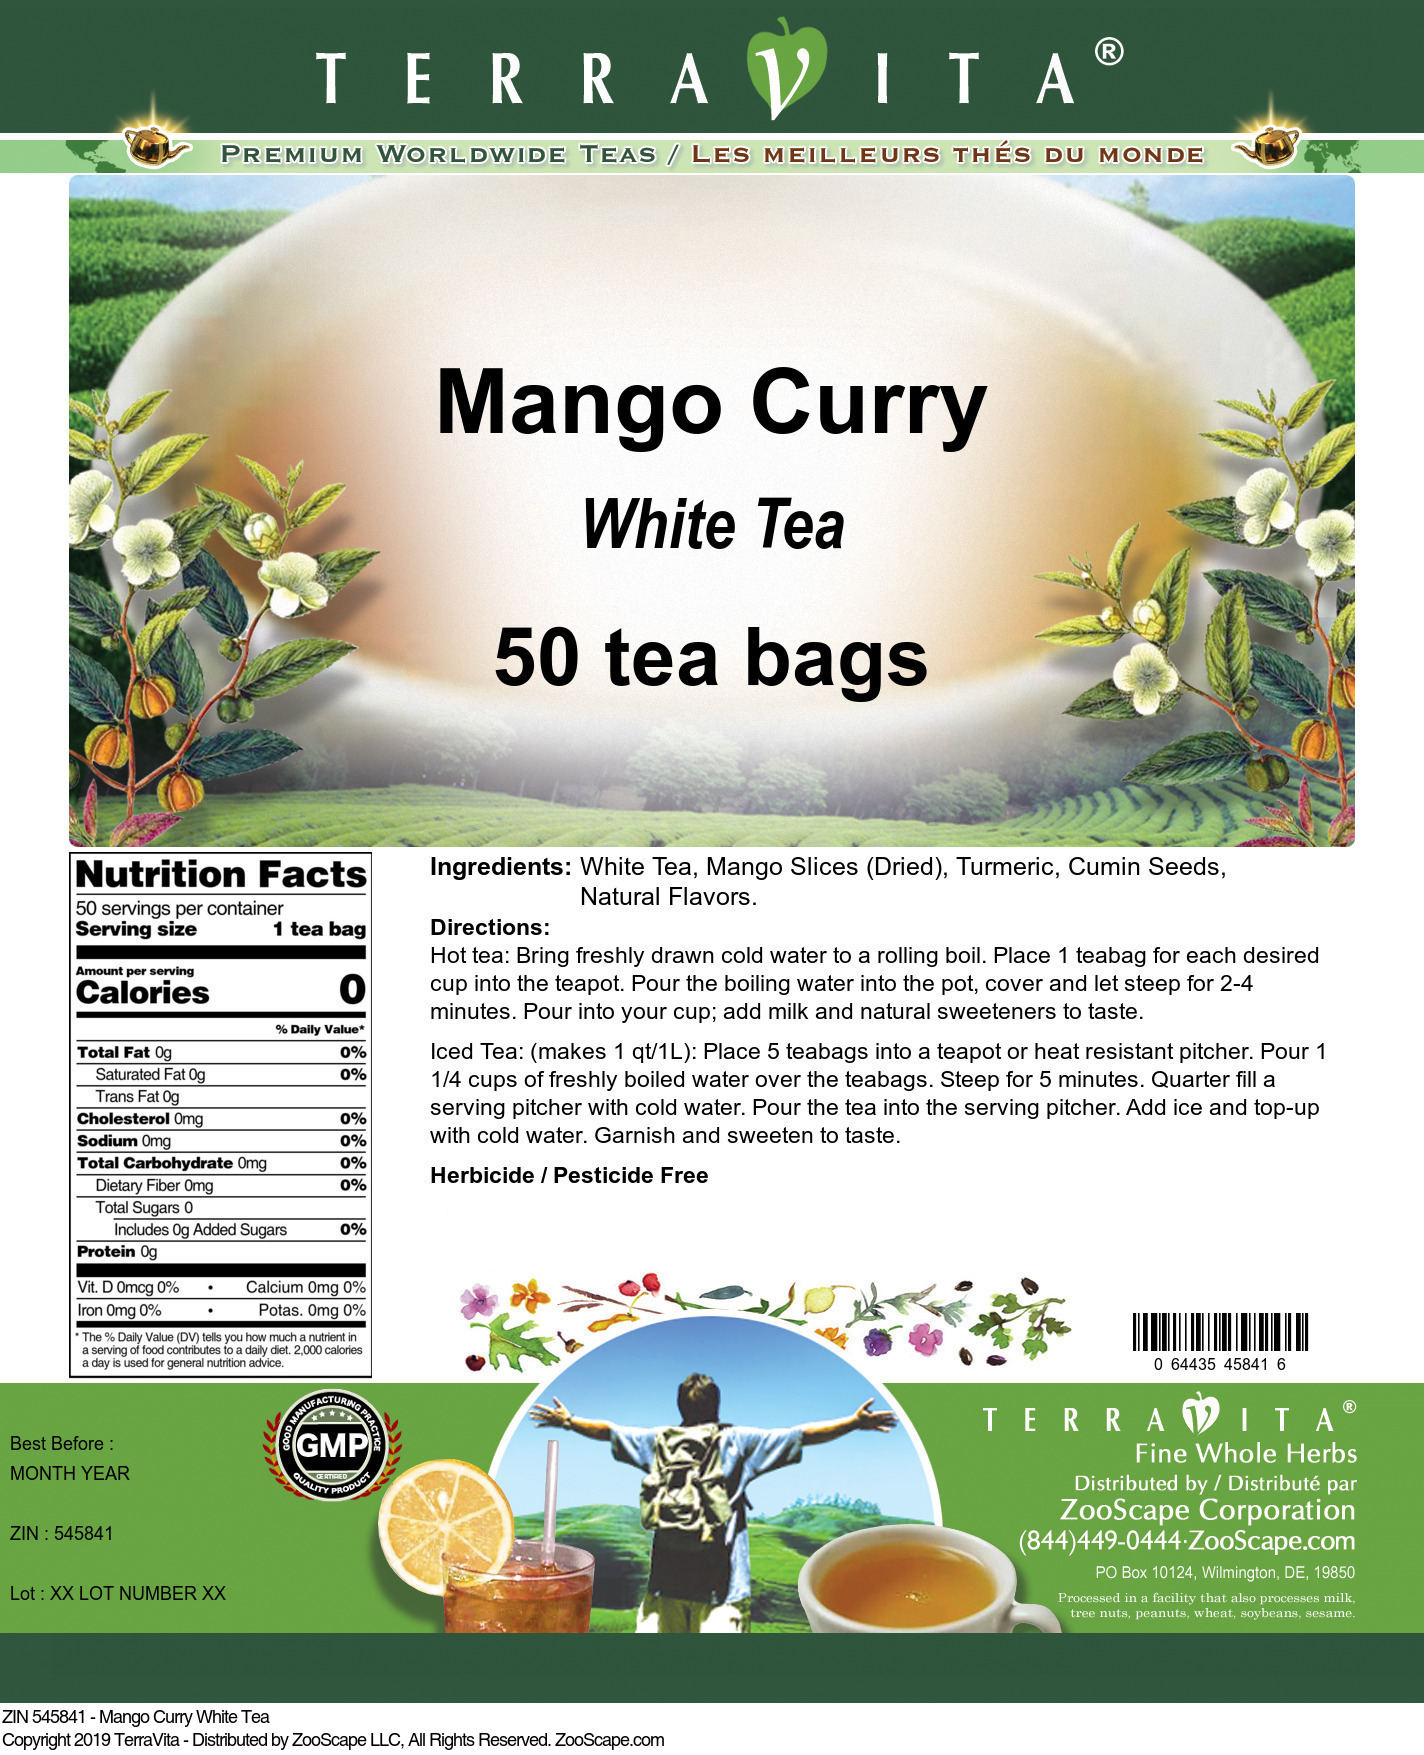 Mango Curry White Tea